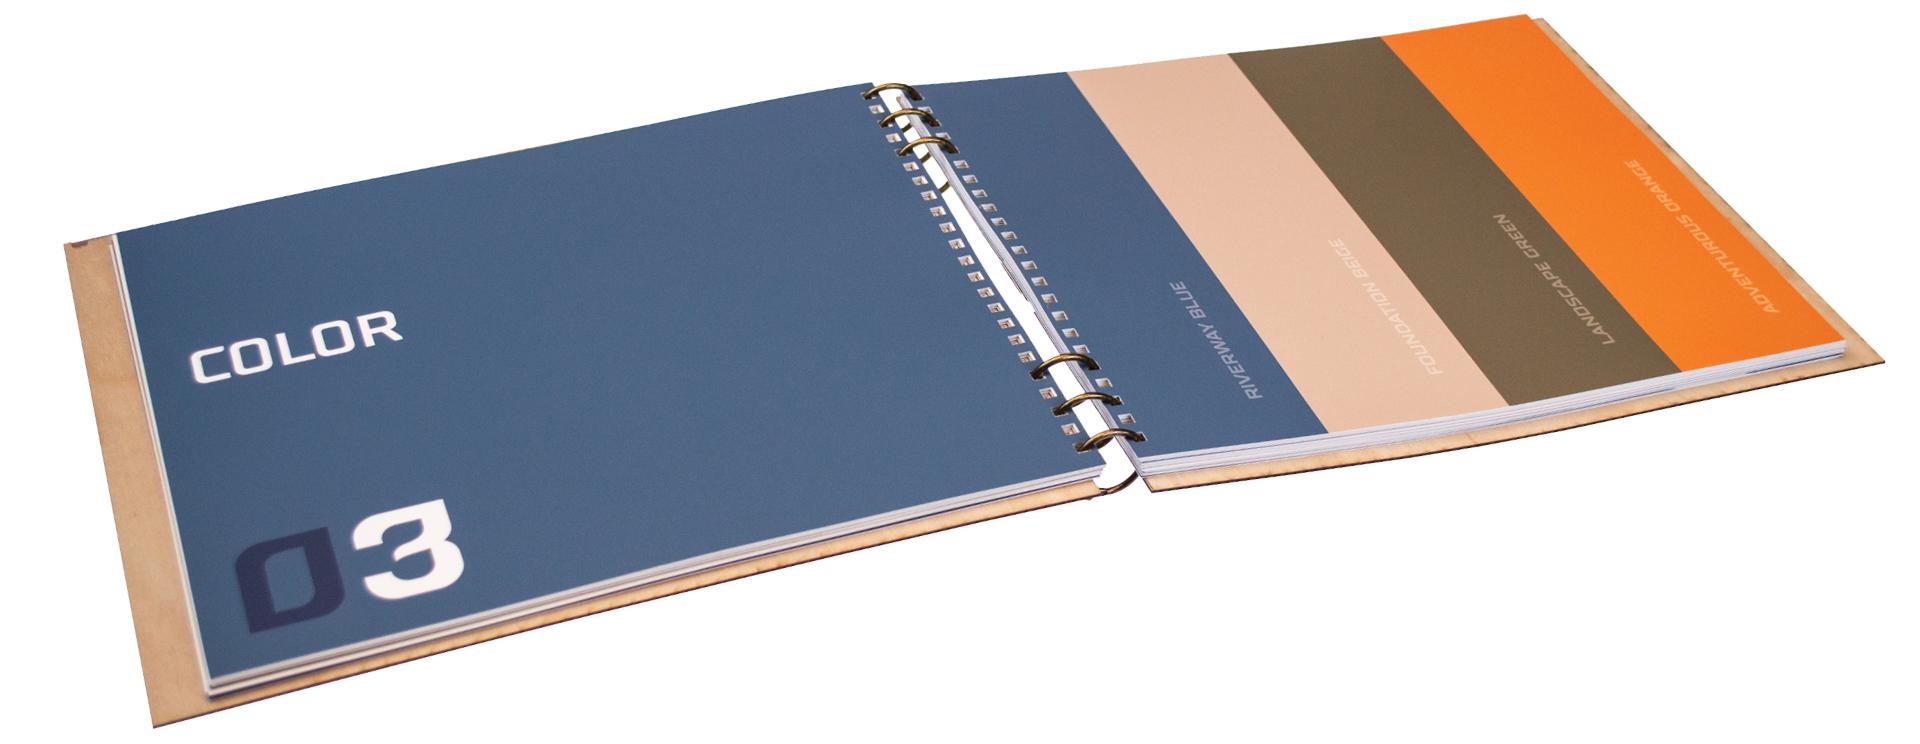 5 Scorebook Color.jpg